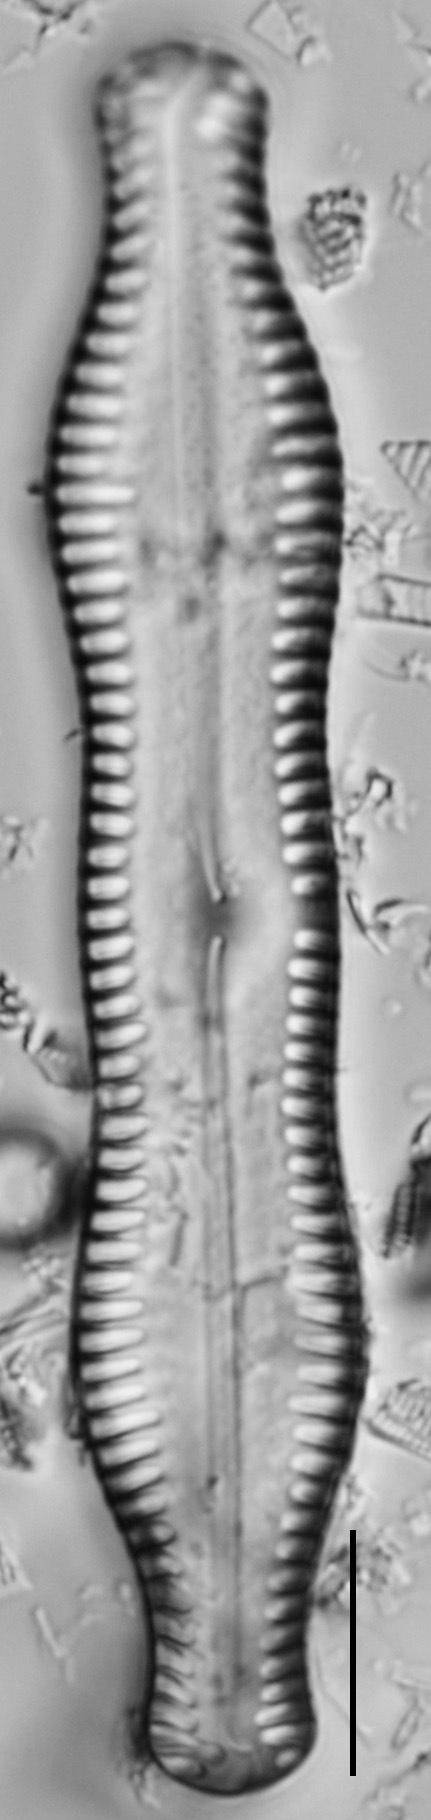 Pinnularia scotica LM2